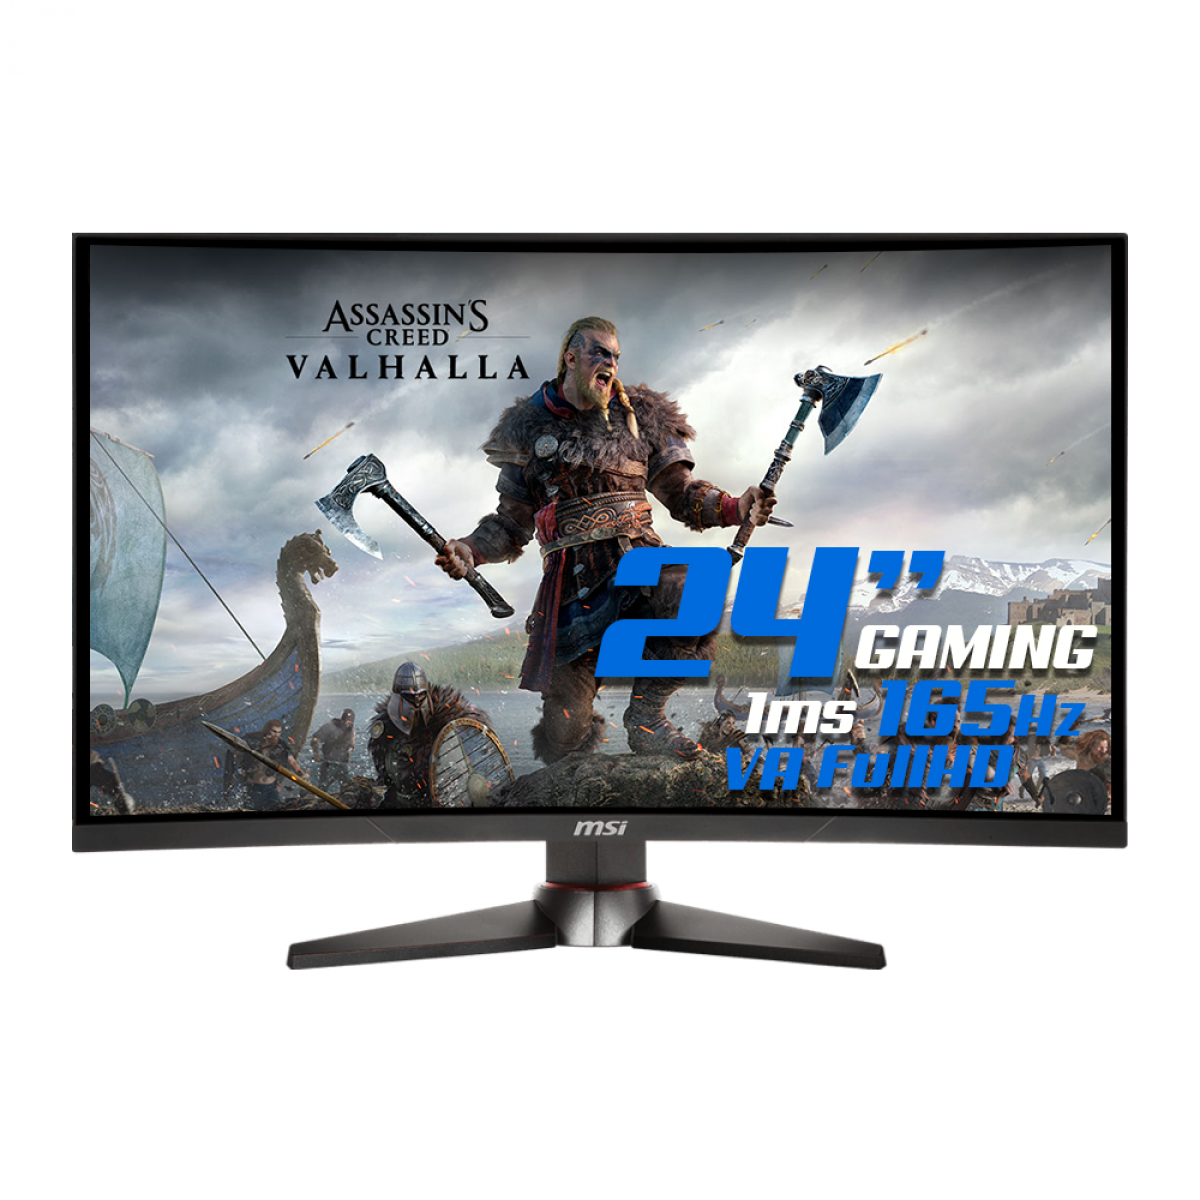 Monitor Gamer MSI Optix, 24 Pol, FullHD, Curvo, 165Hz, 1ms, HDMI/DP, MAG240CR